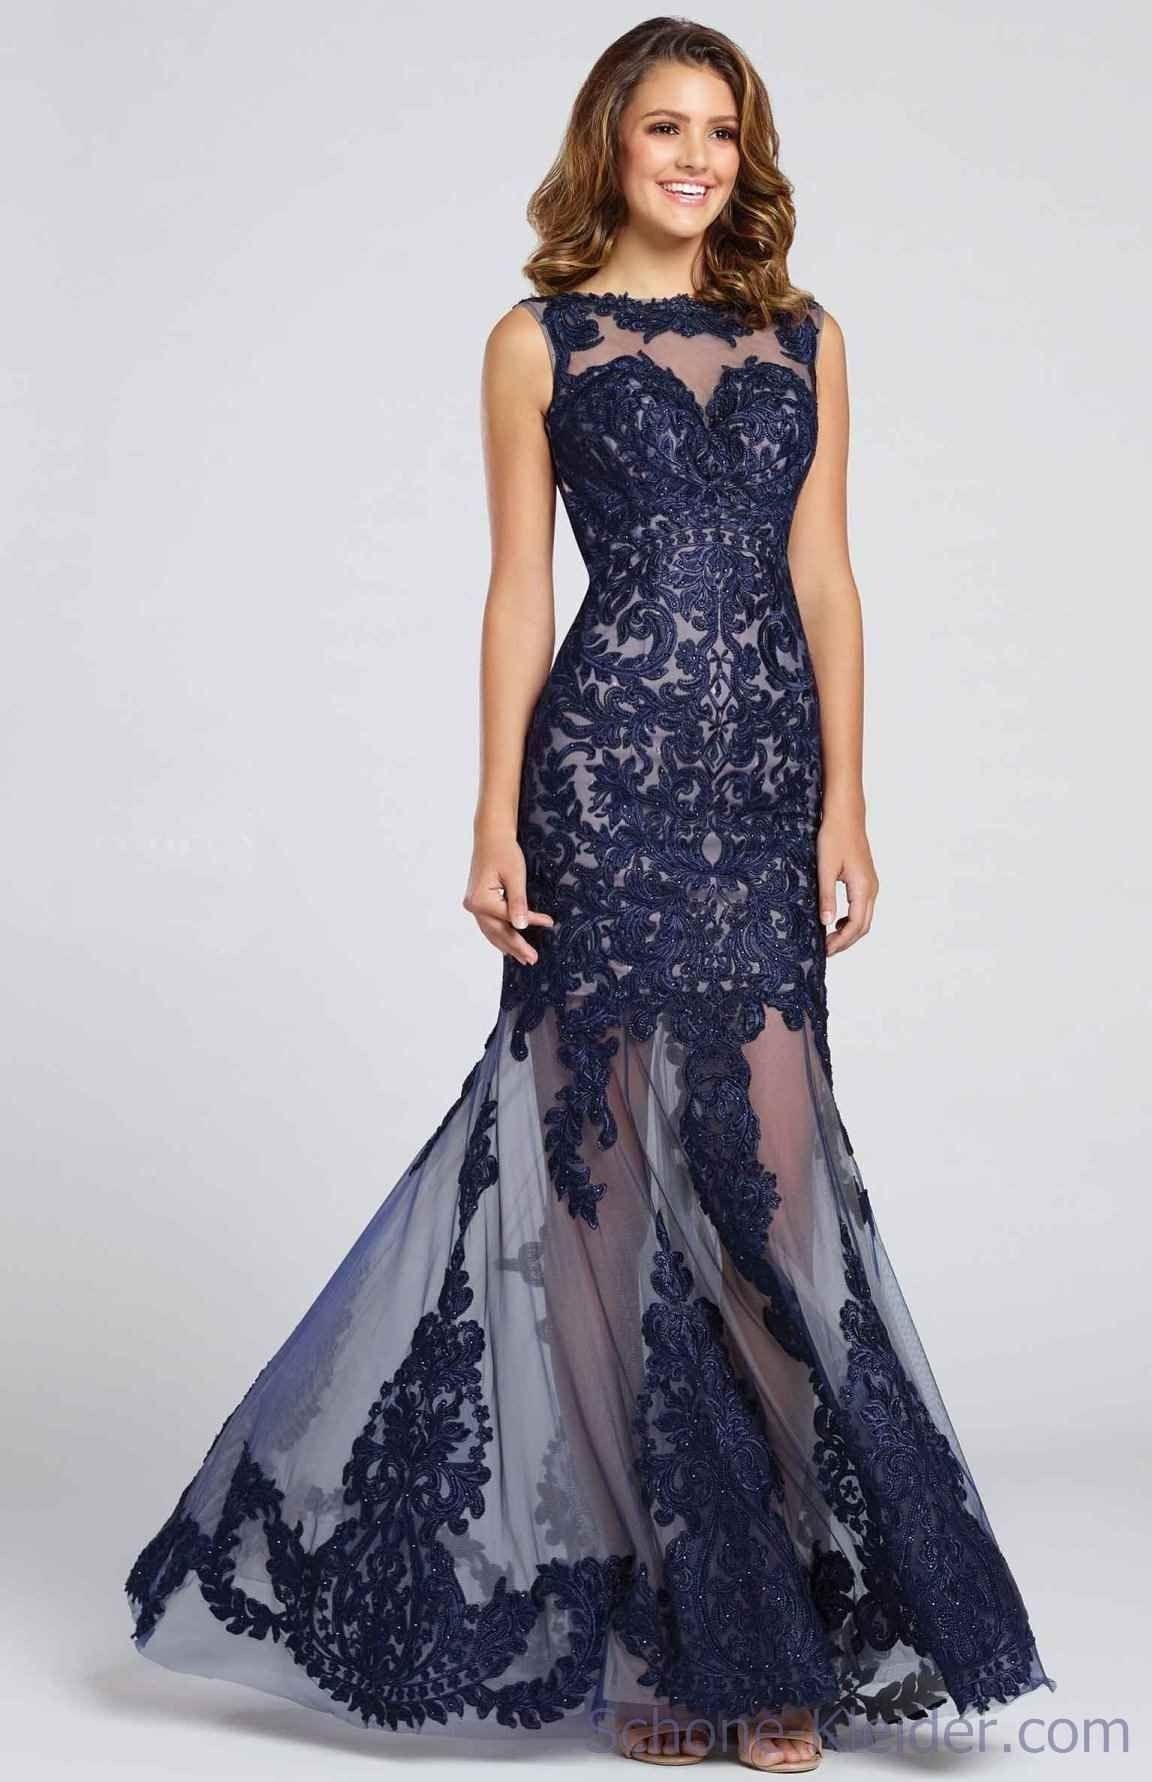 Cool Abendkleider Lang Junge Mode Stylish13 Elegant Abendkleider Lang Junge Mode für 2019